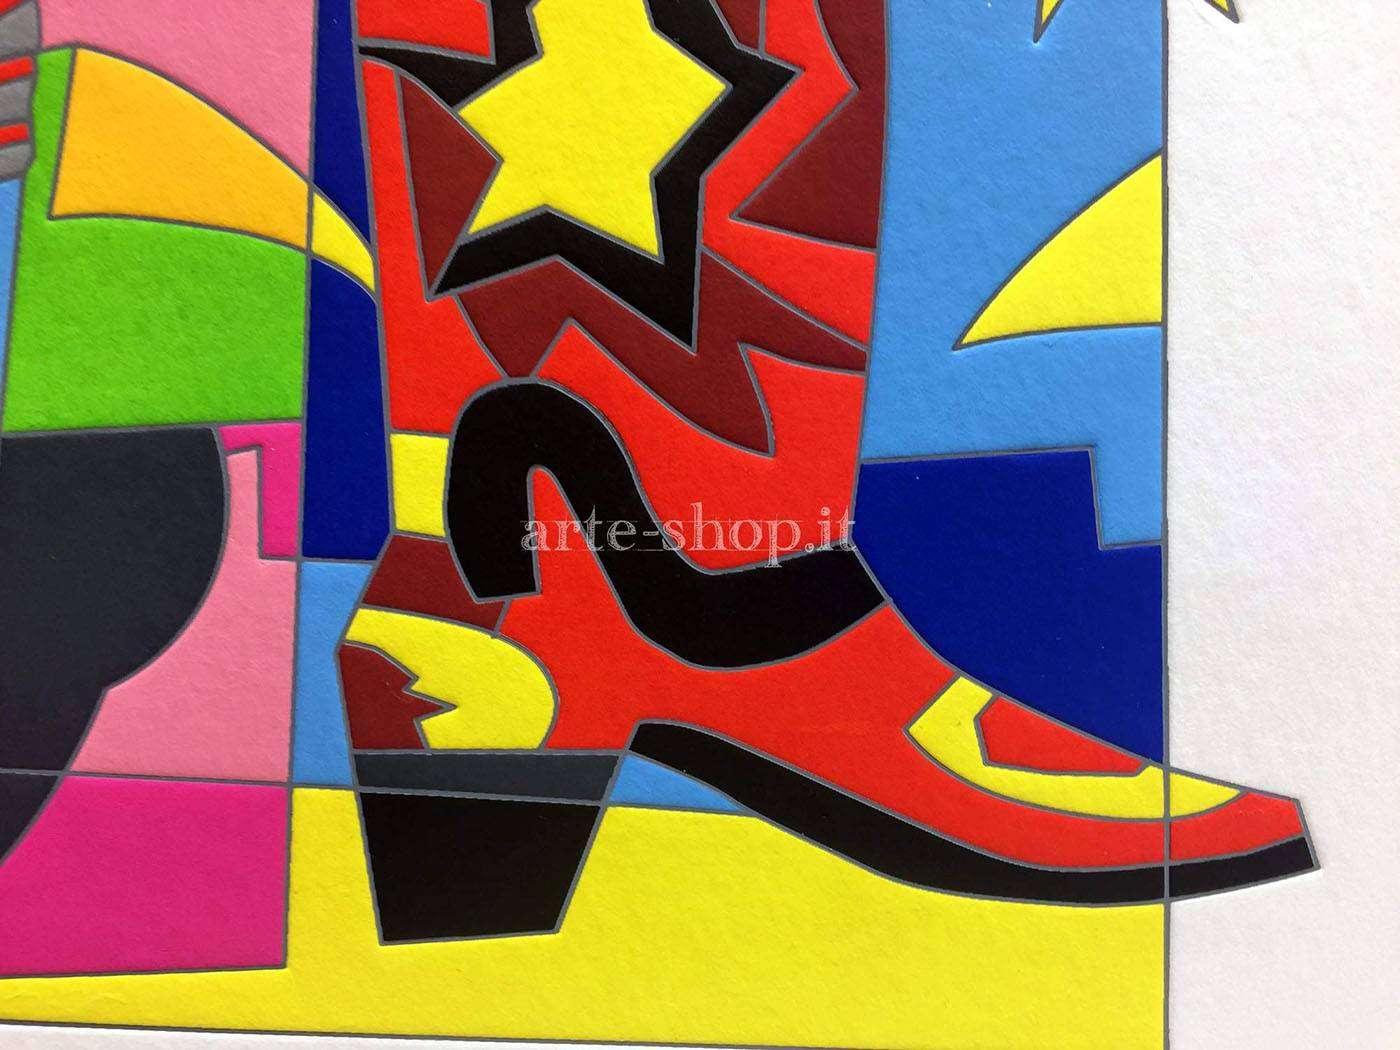 arte pentagono shop dettaglio numero 250